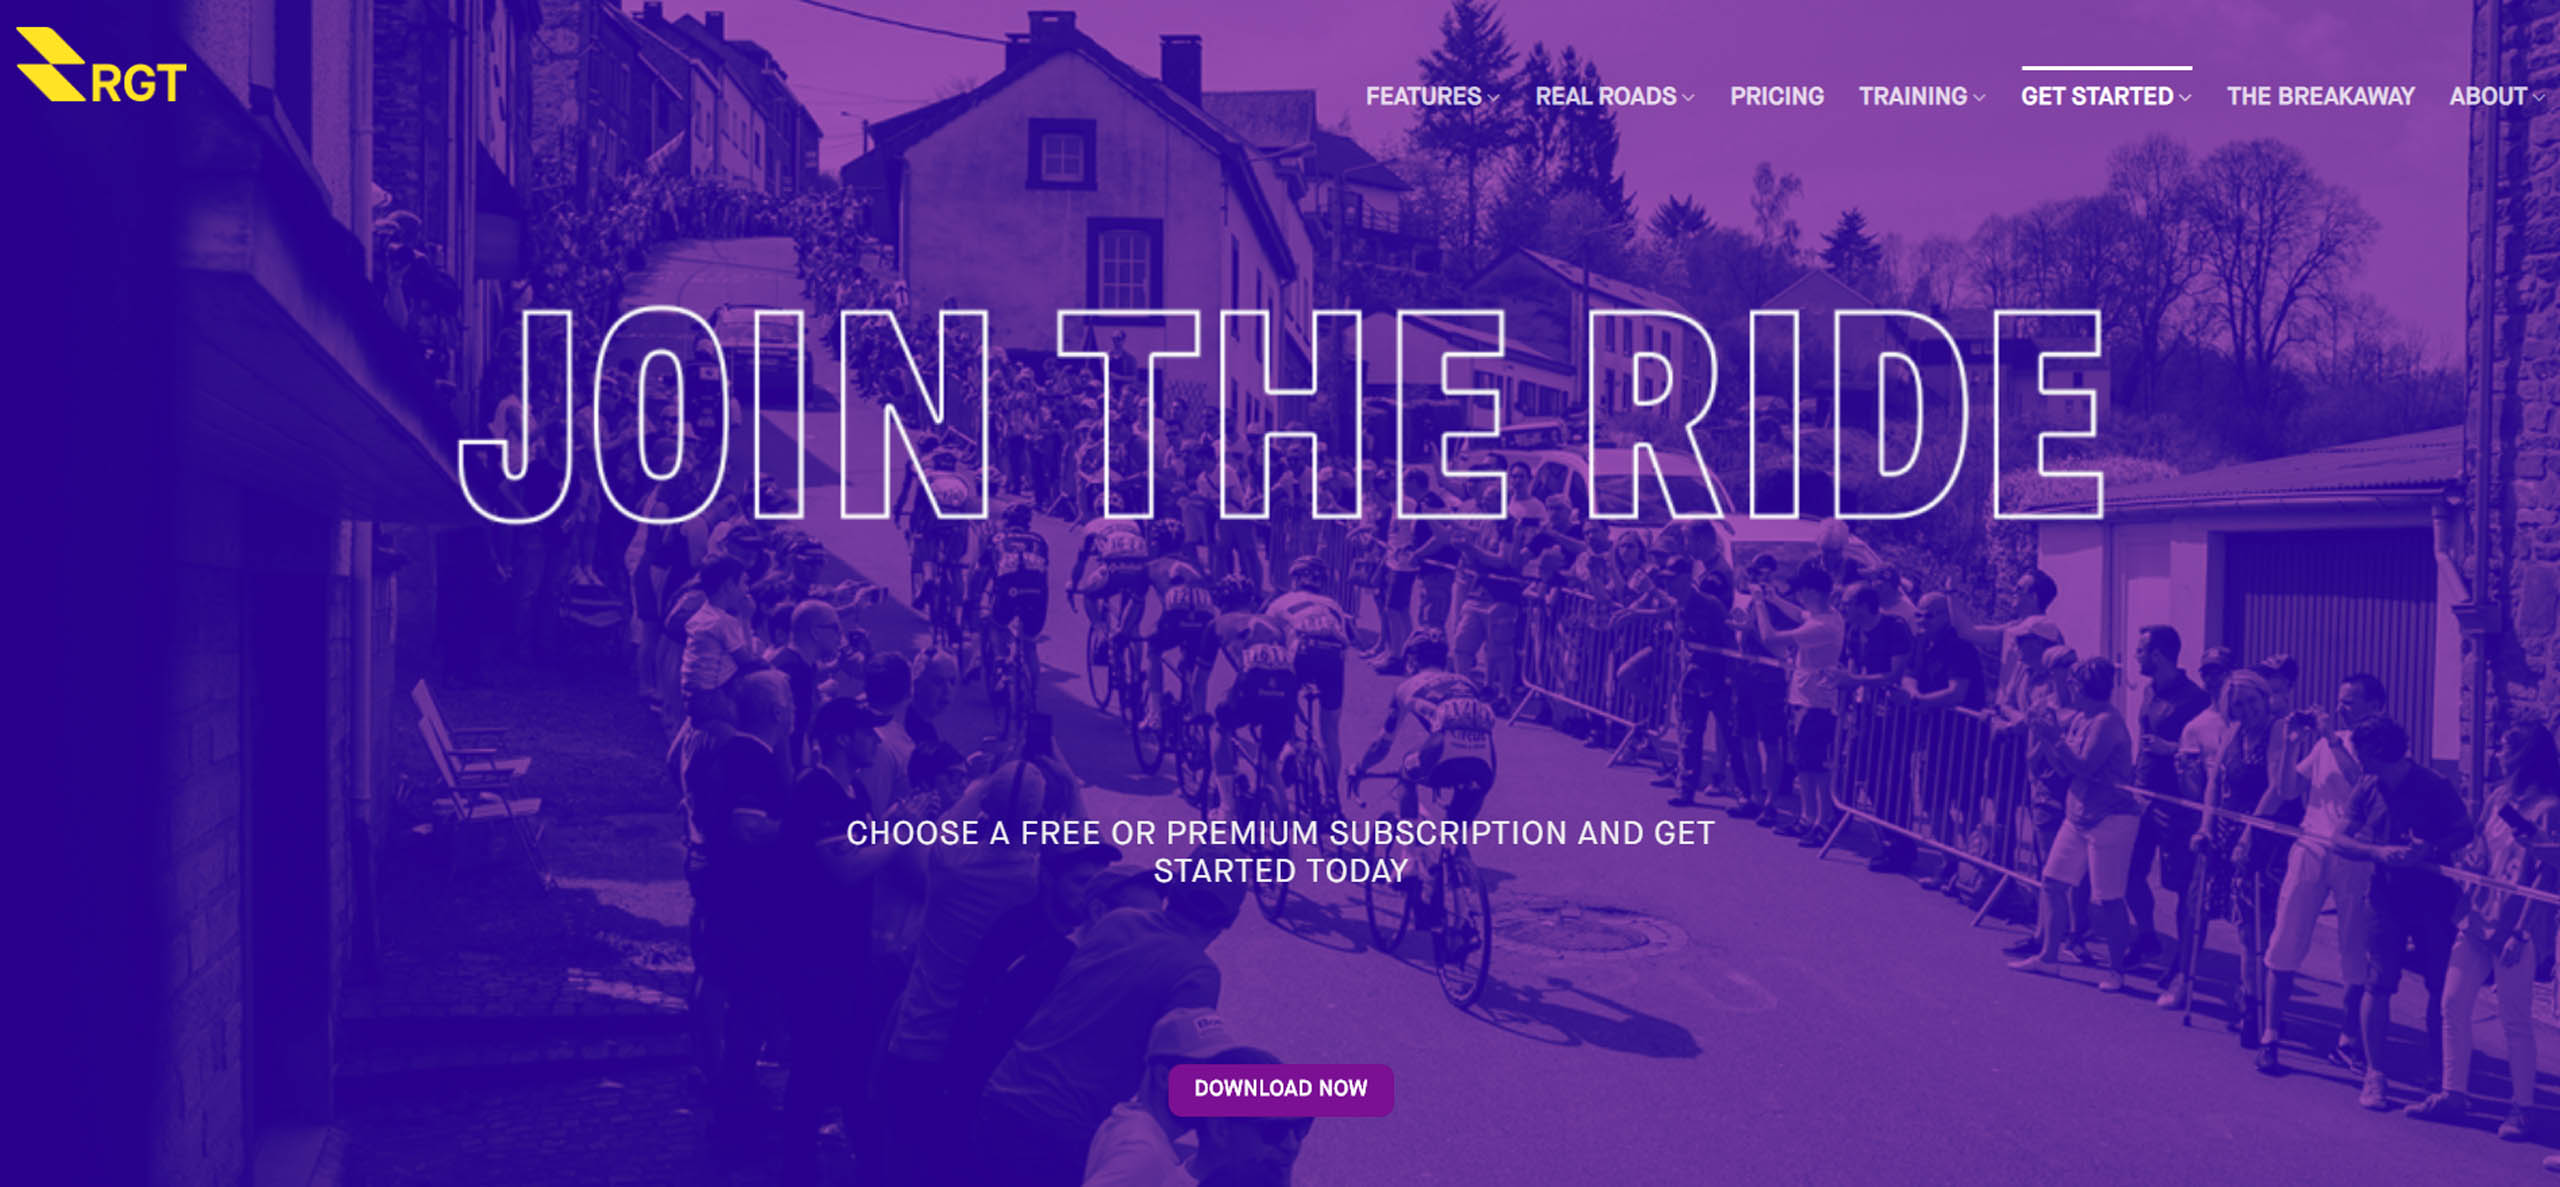 RGT Cycling #rideitout